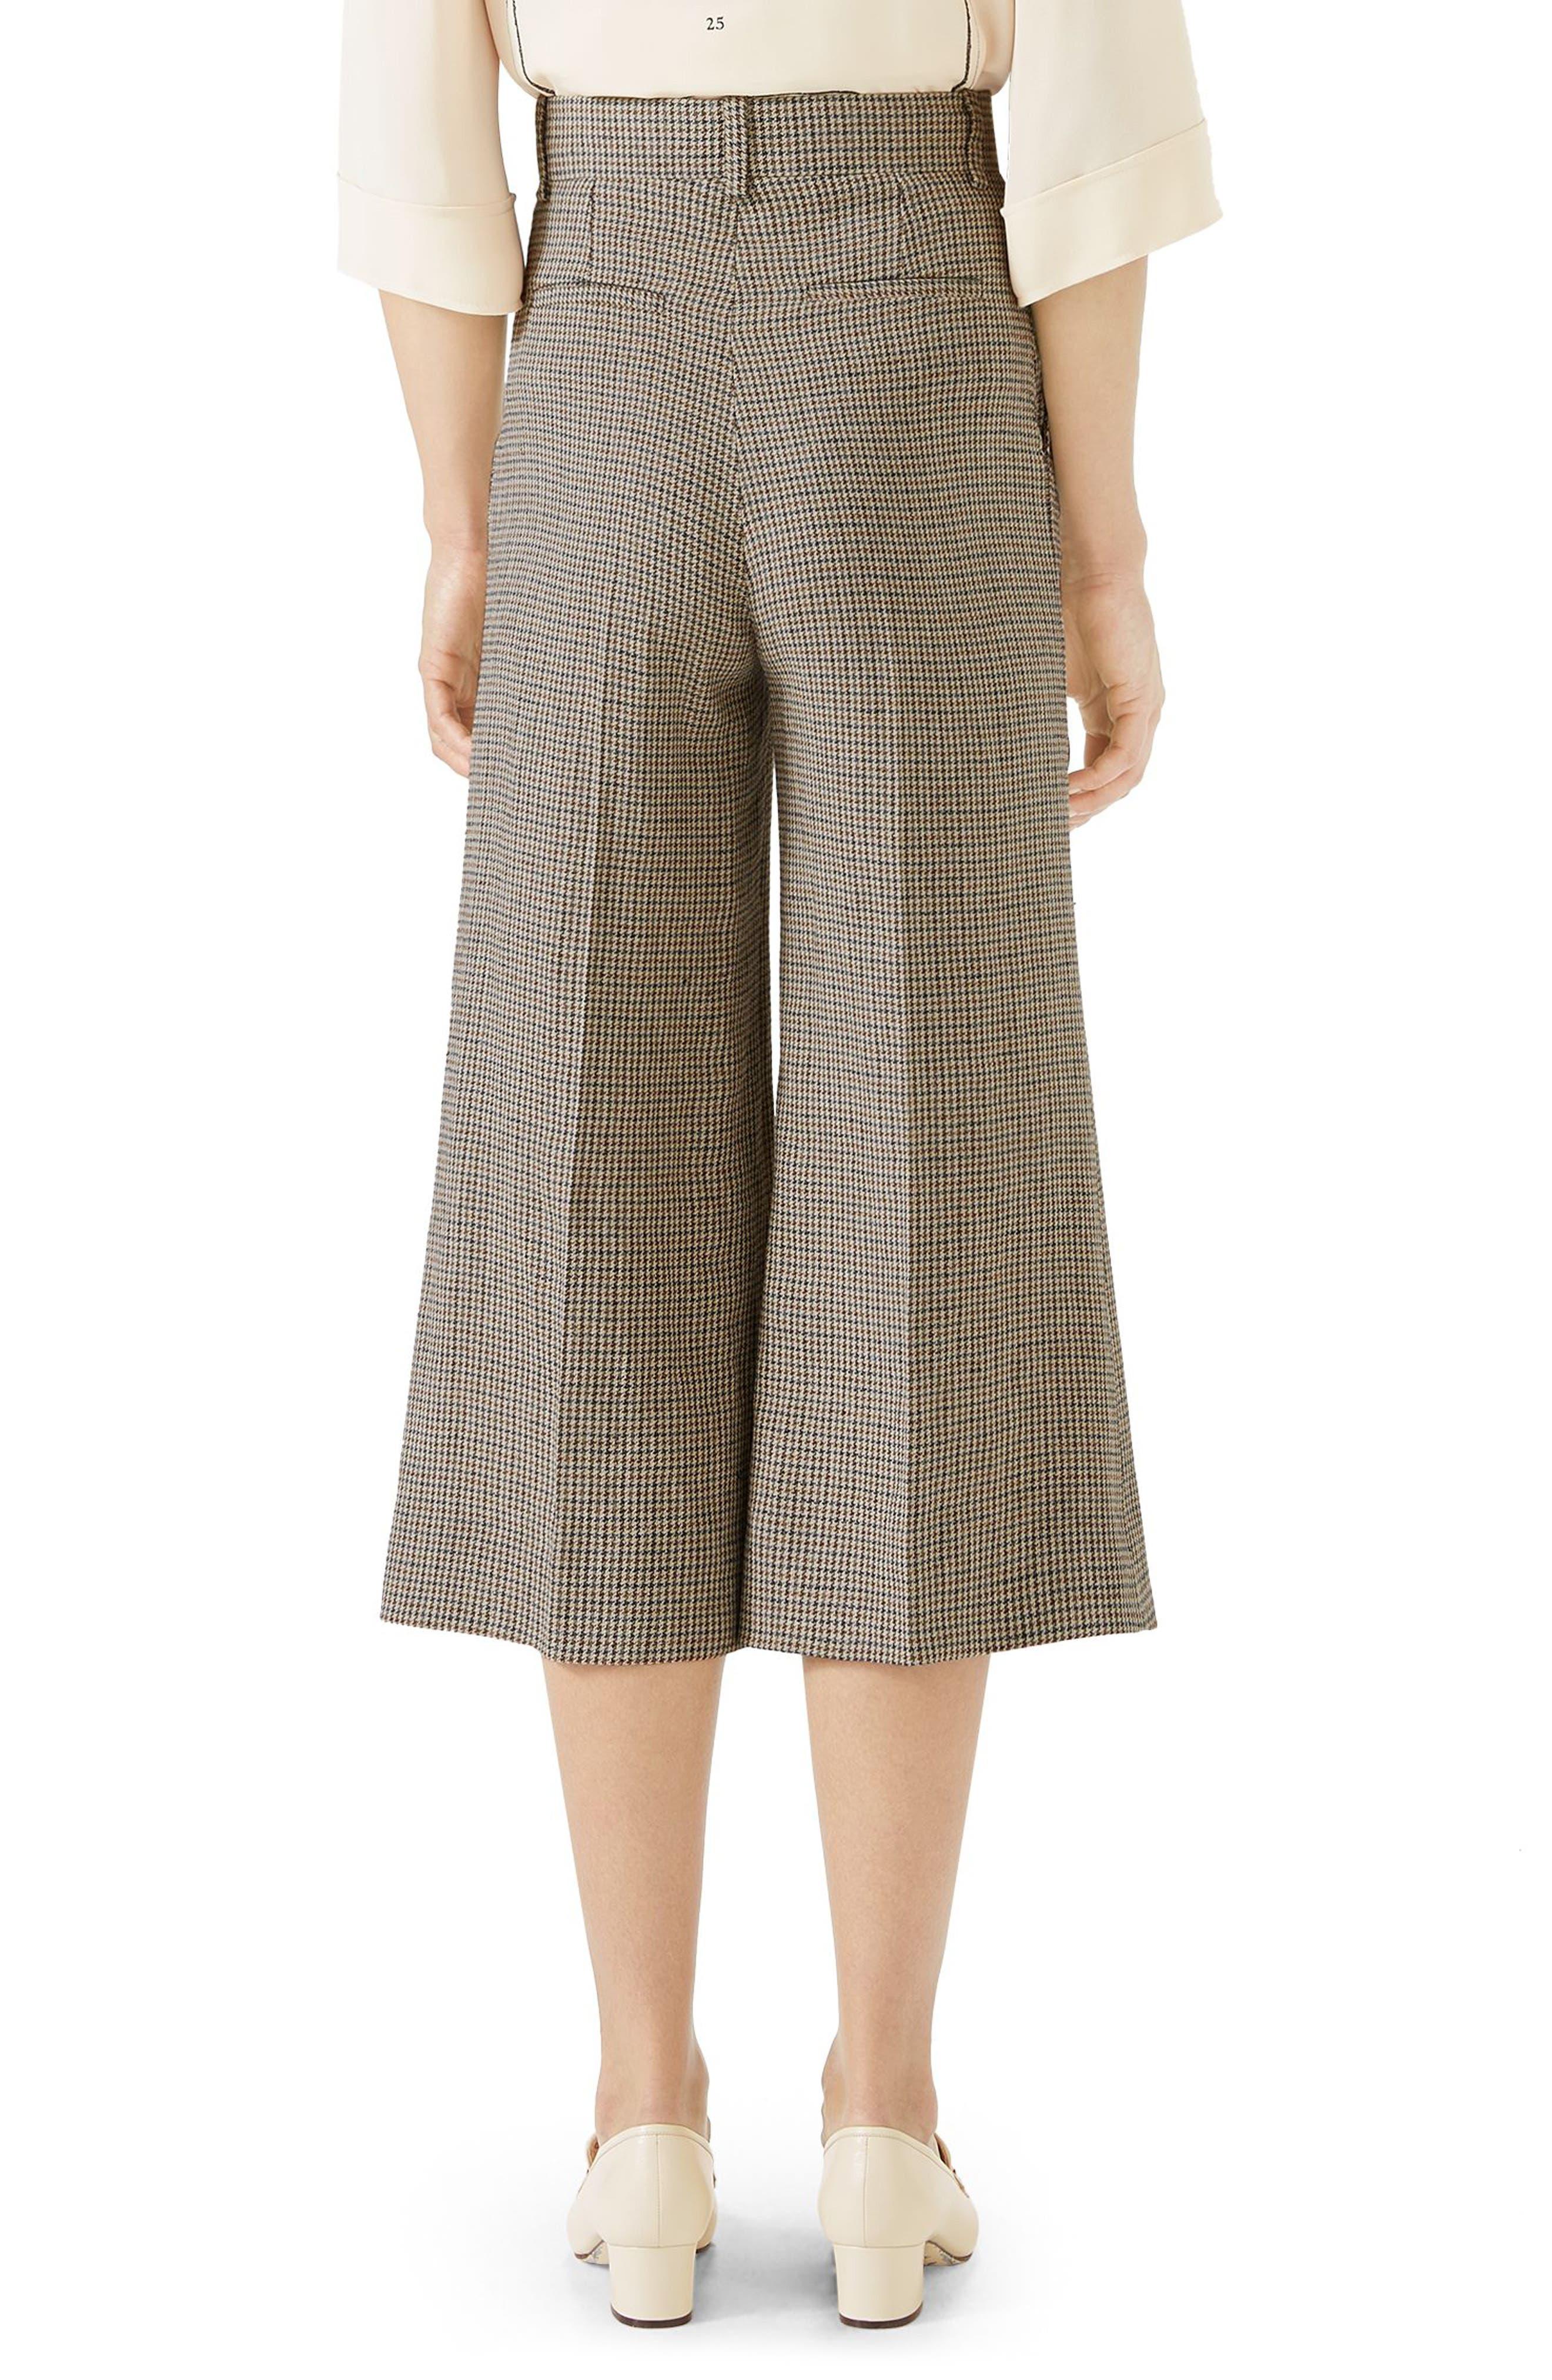 Houndstooth Wide Leg Crop Linen Pants,                             Alternate thumbnail 2, color,                             BEIGE/ BRUN DEGARANCE